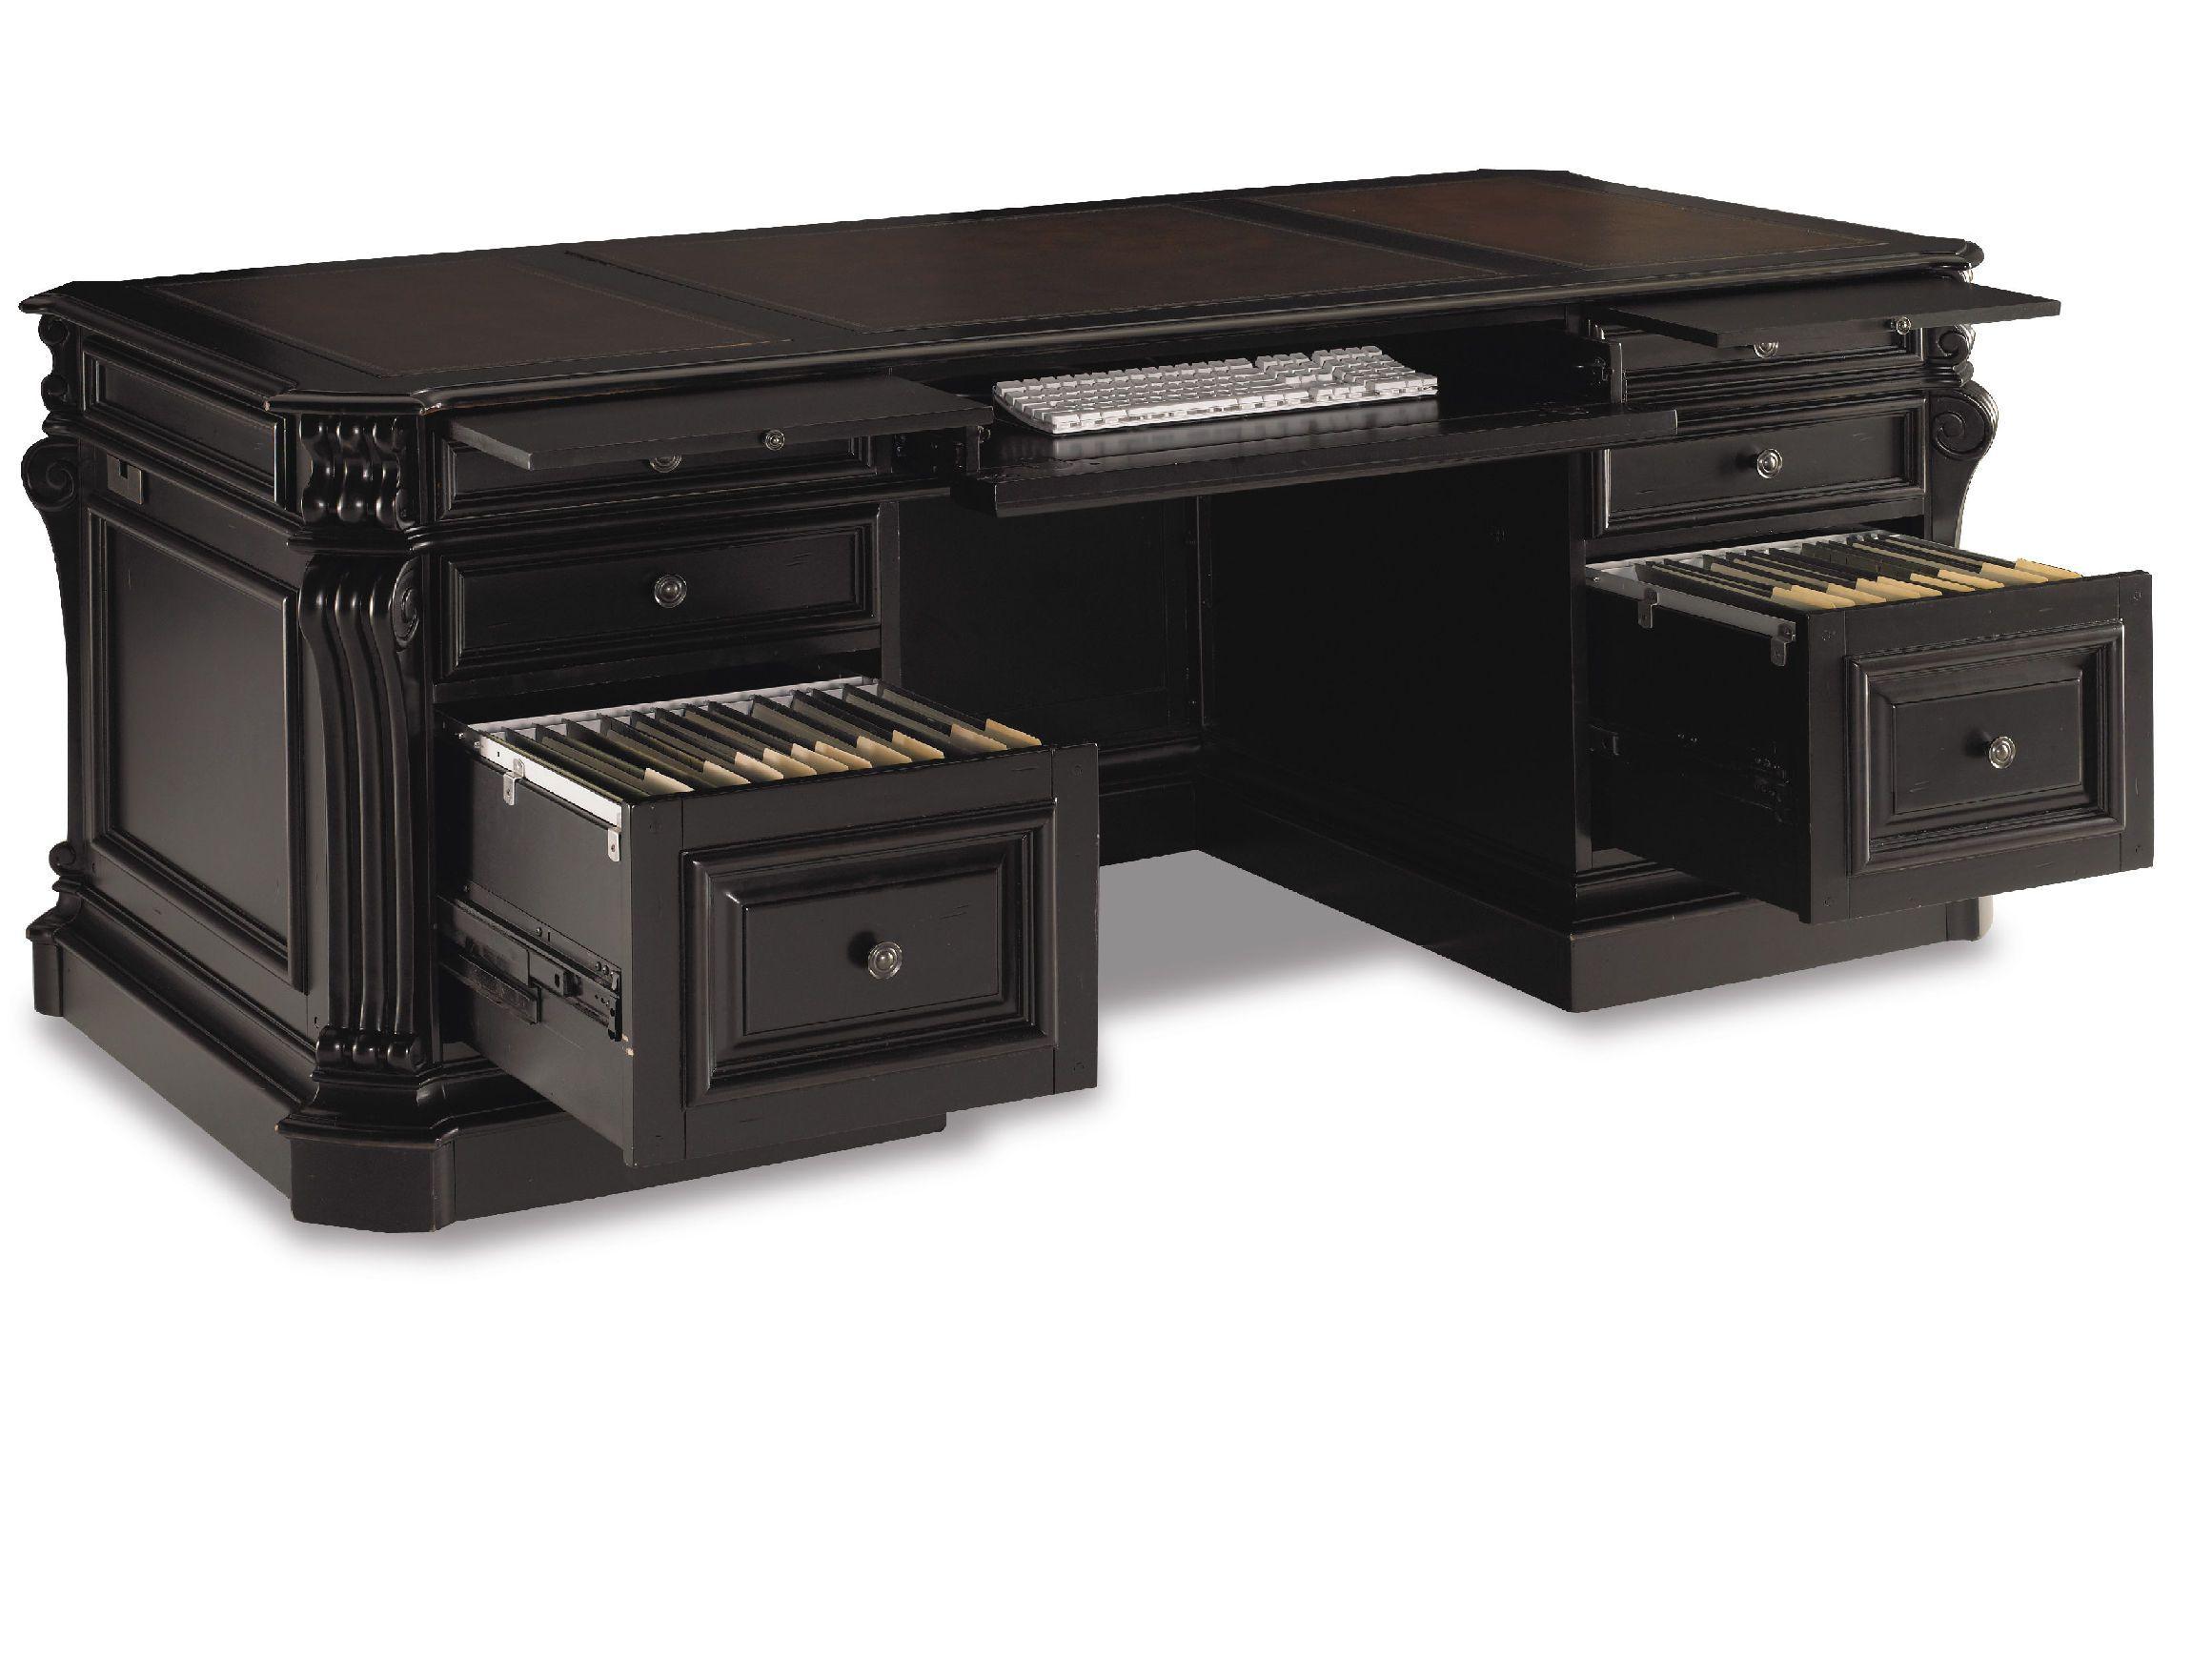 Hooker Furniture Home Office Executive Desk 370 10 363   Marty Raes Of  Lexington